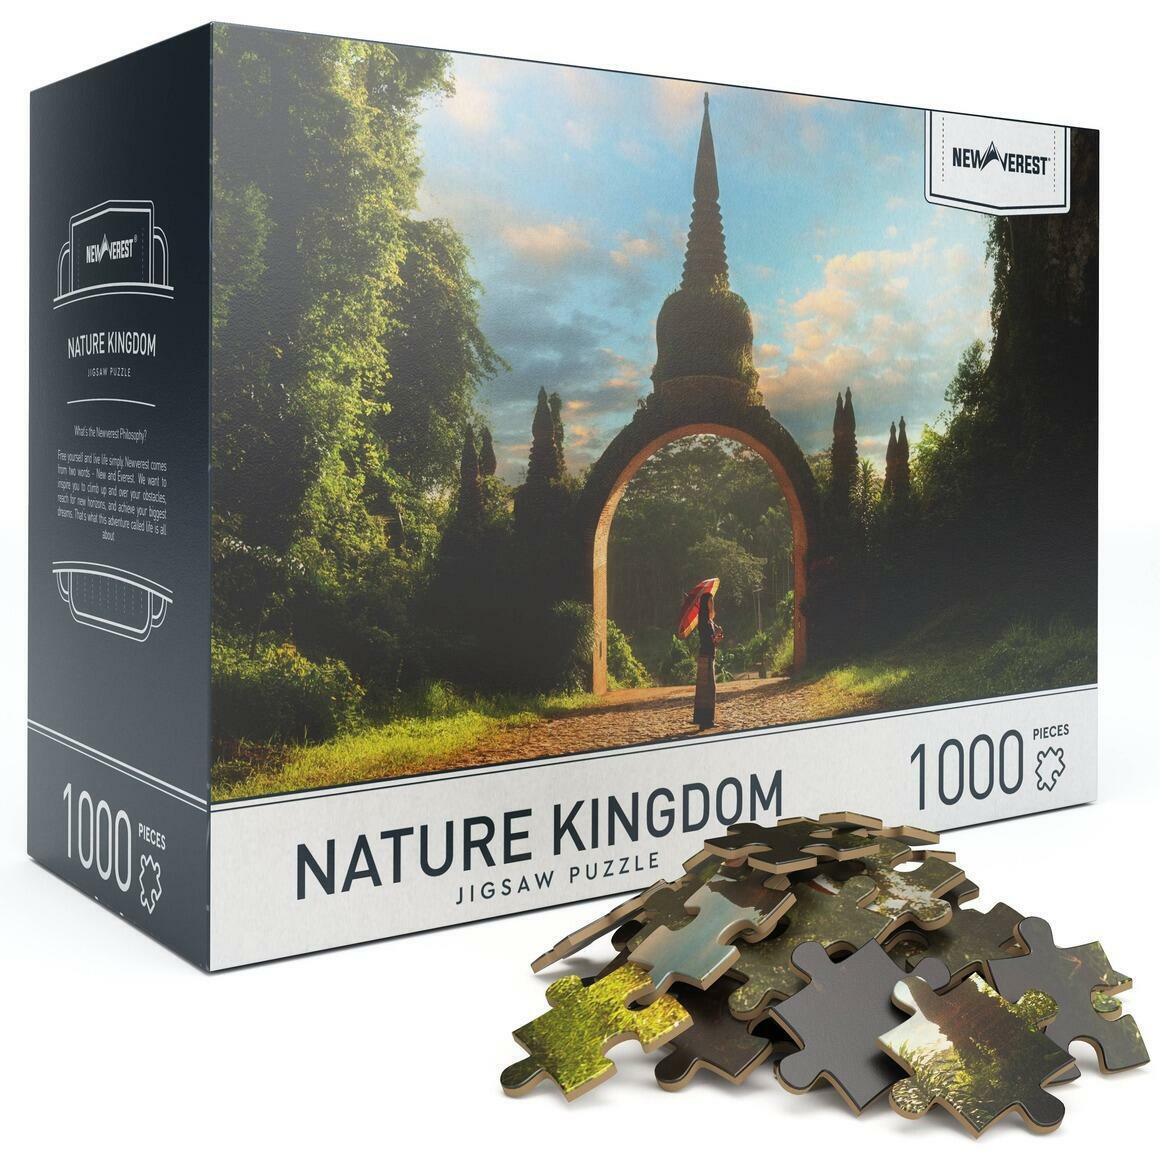 1000 pcs Newverest Nature Kingdom Jigsaw Puzzle | Trada Marketplace